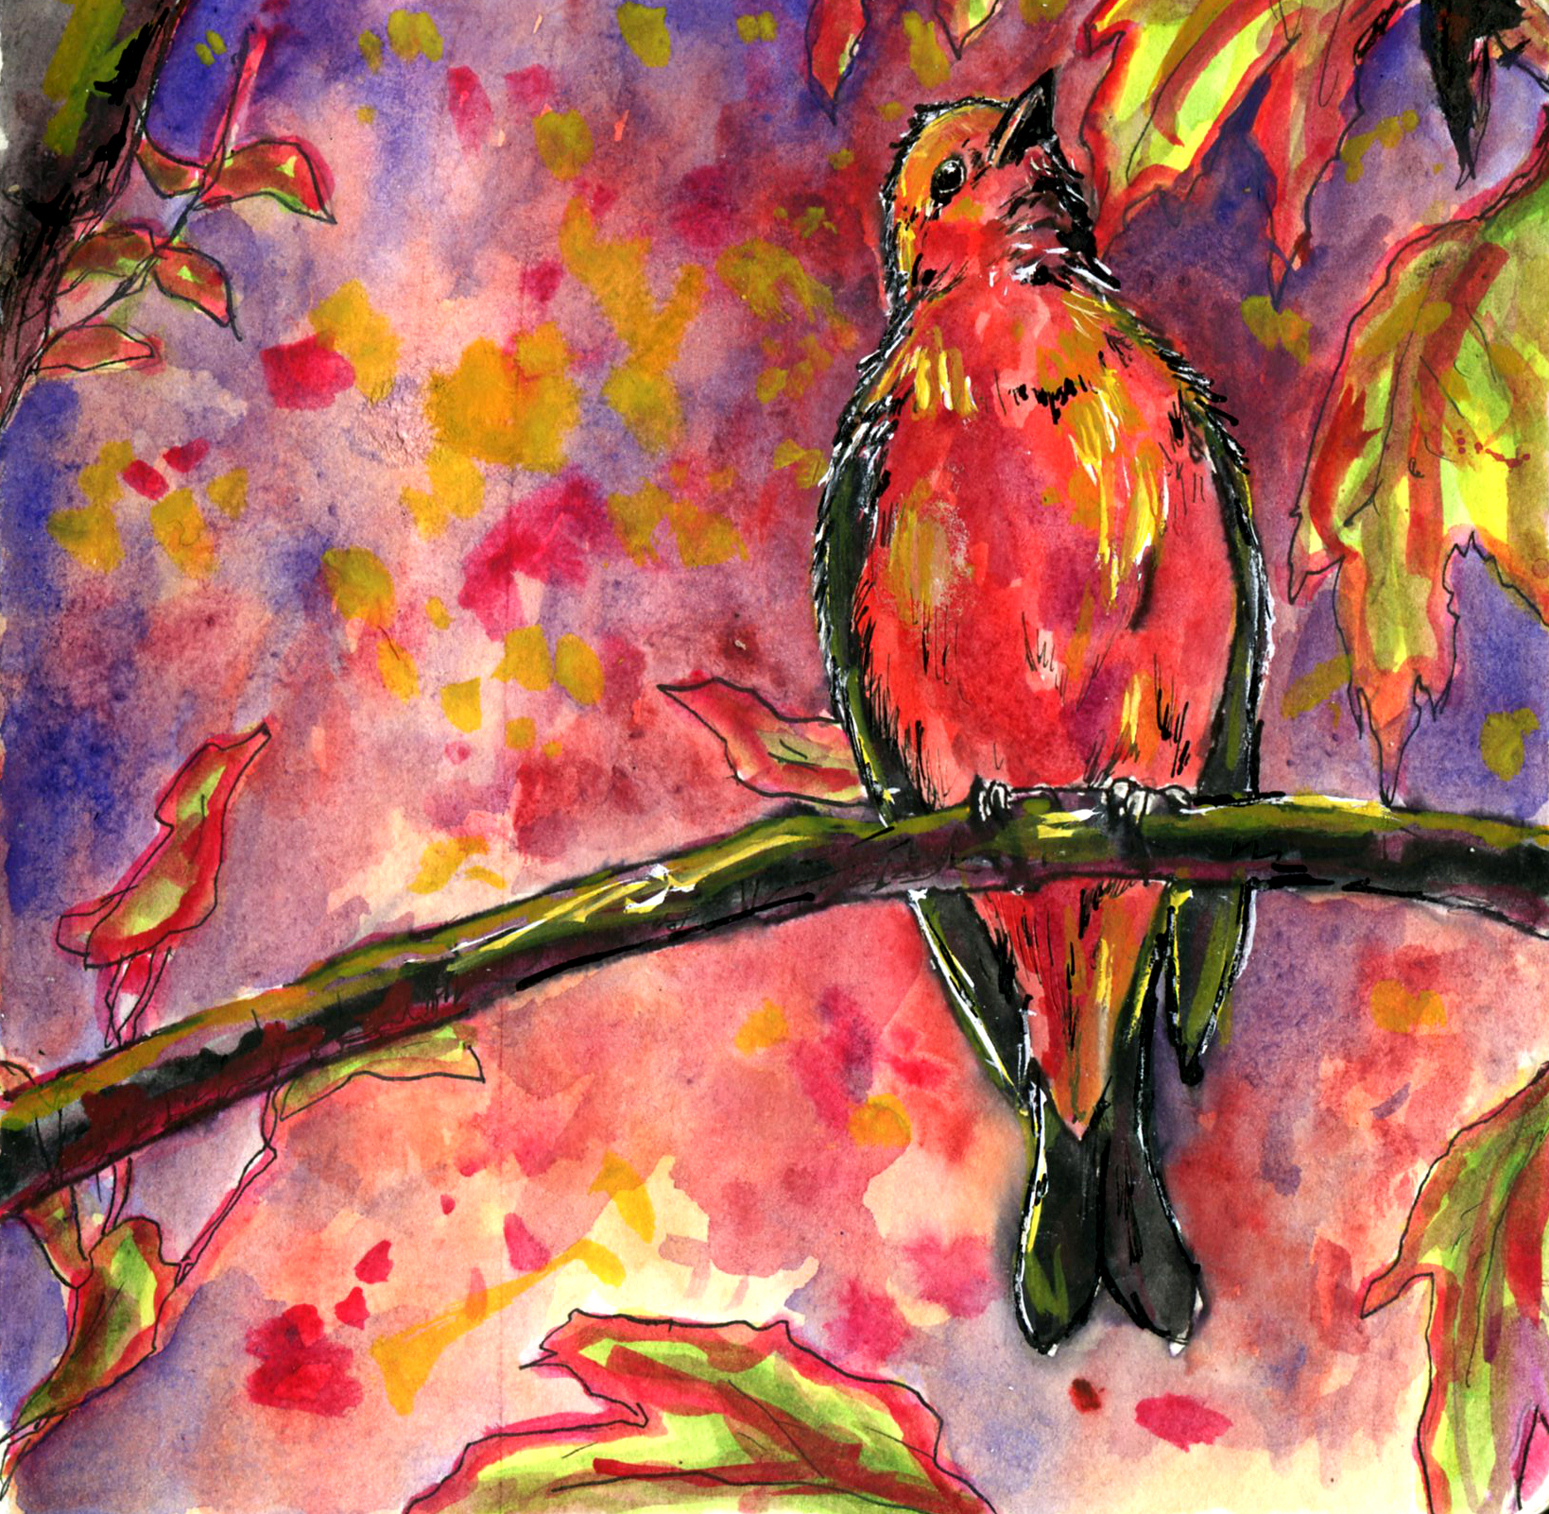 26. Scarlet Tanager